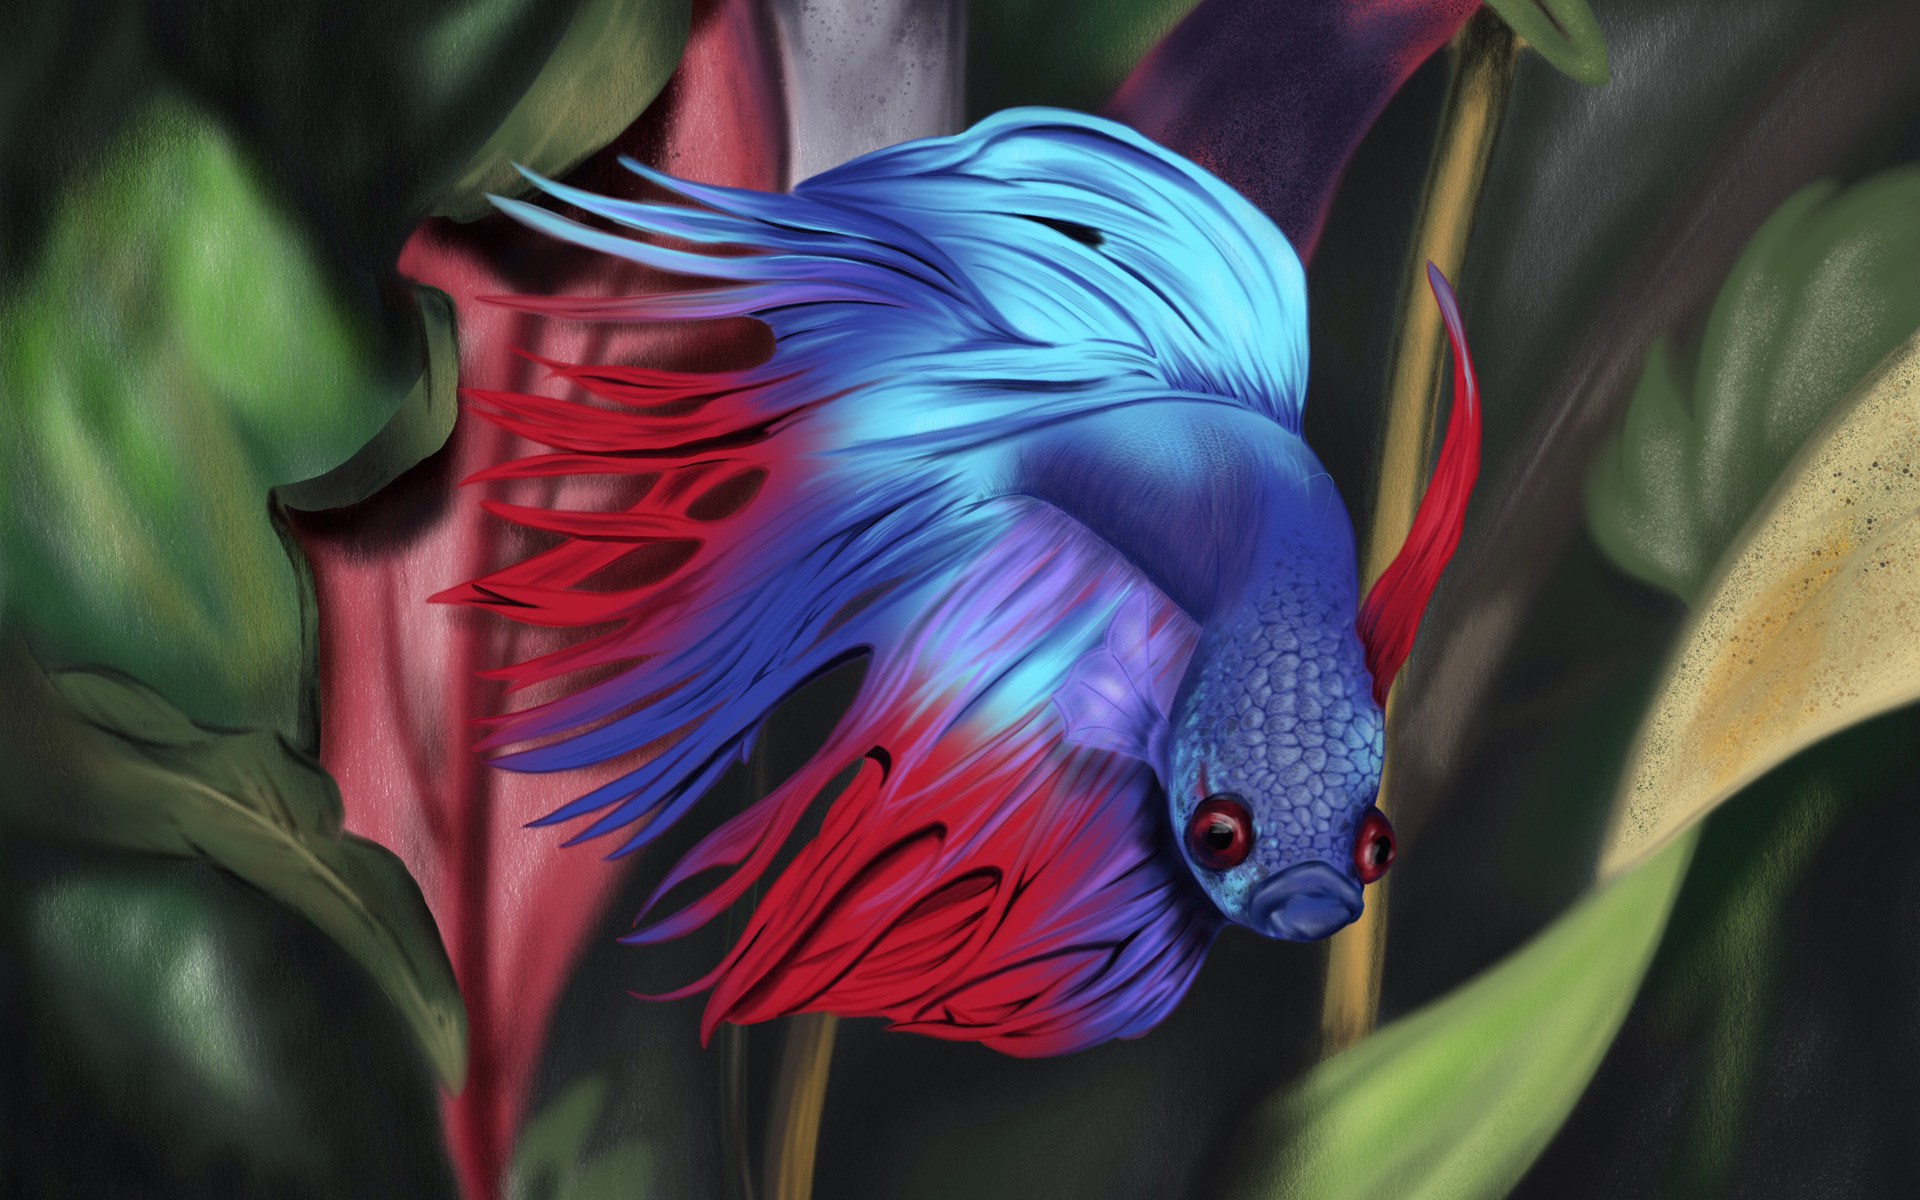 home_artist_port_ill_fish